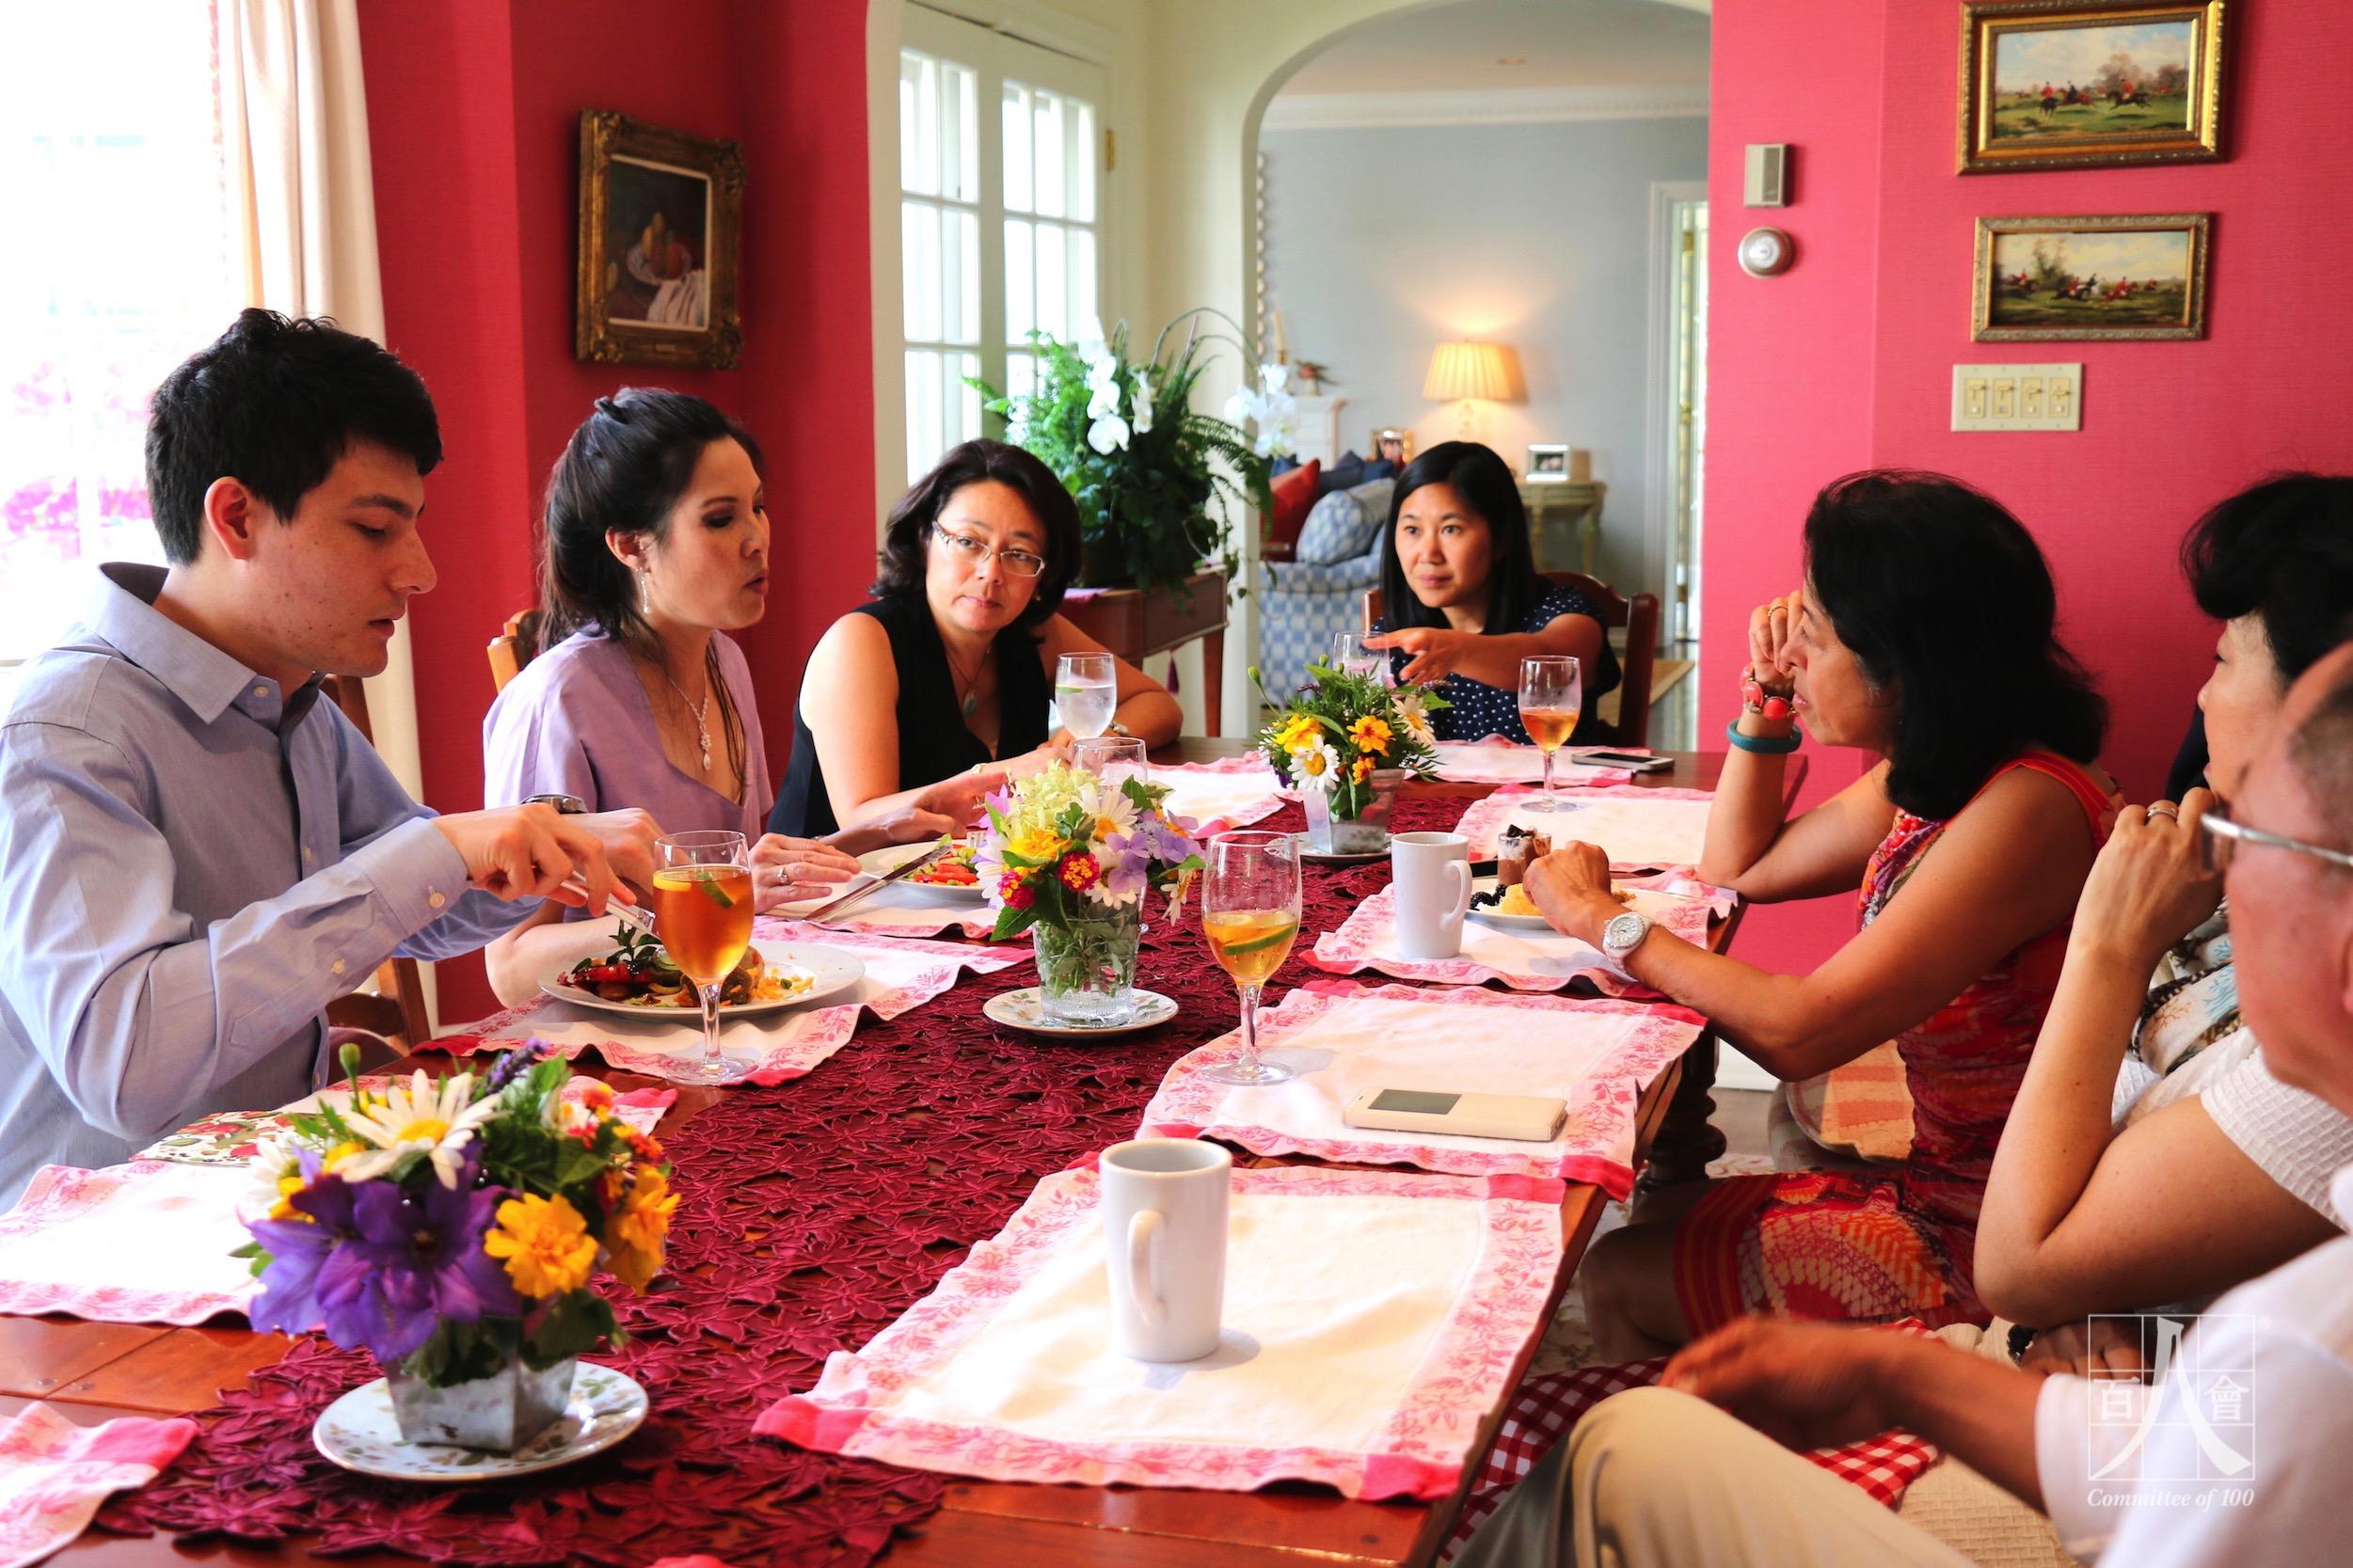 IMG_0584 Dinner Table Sheryl WuDunn